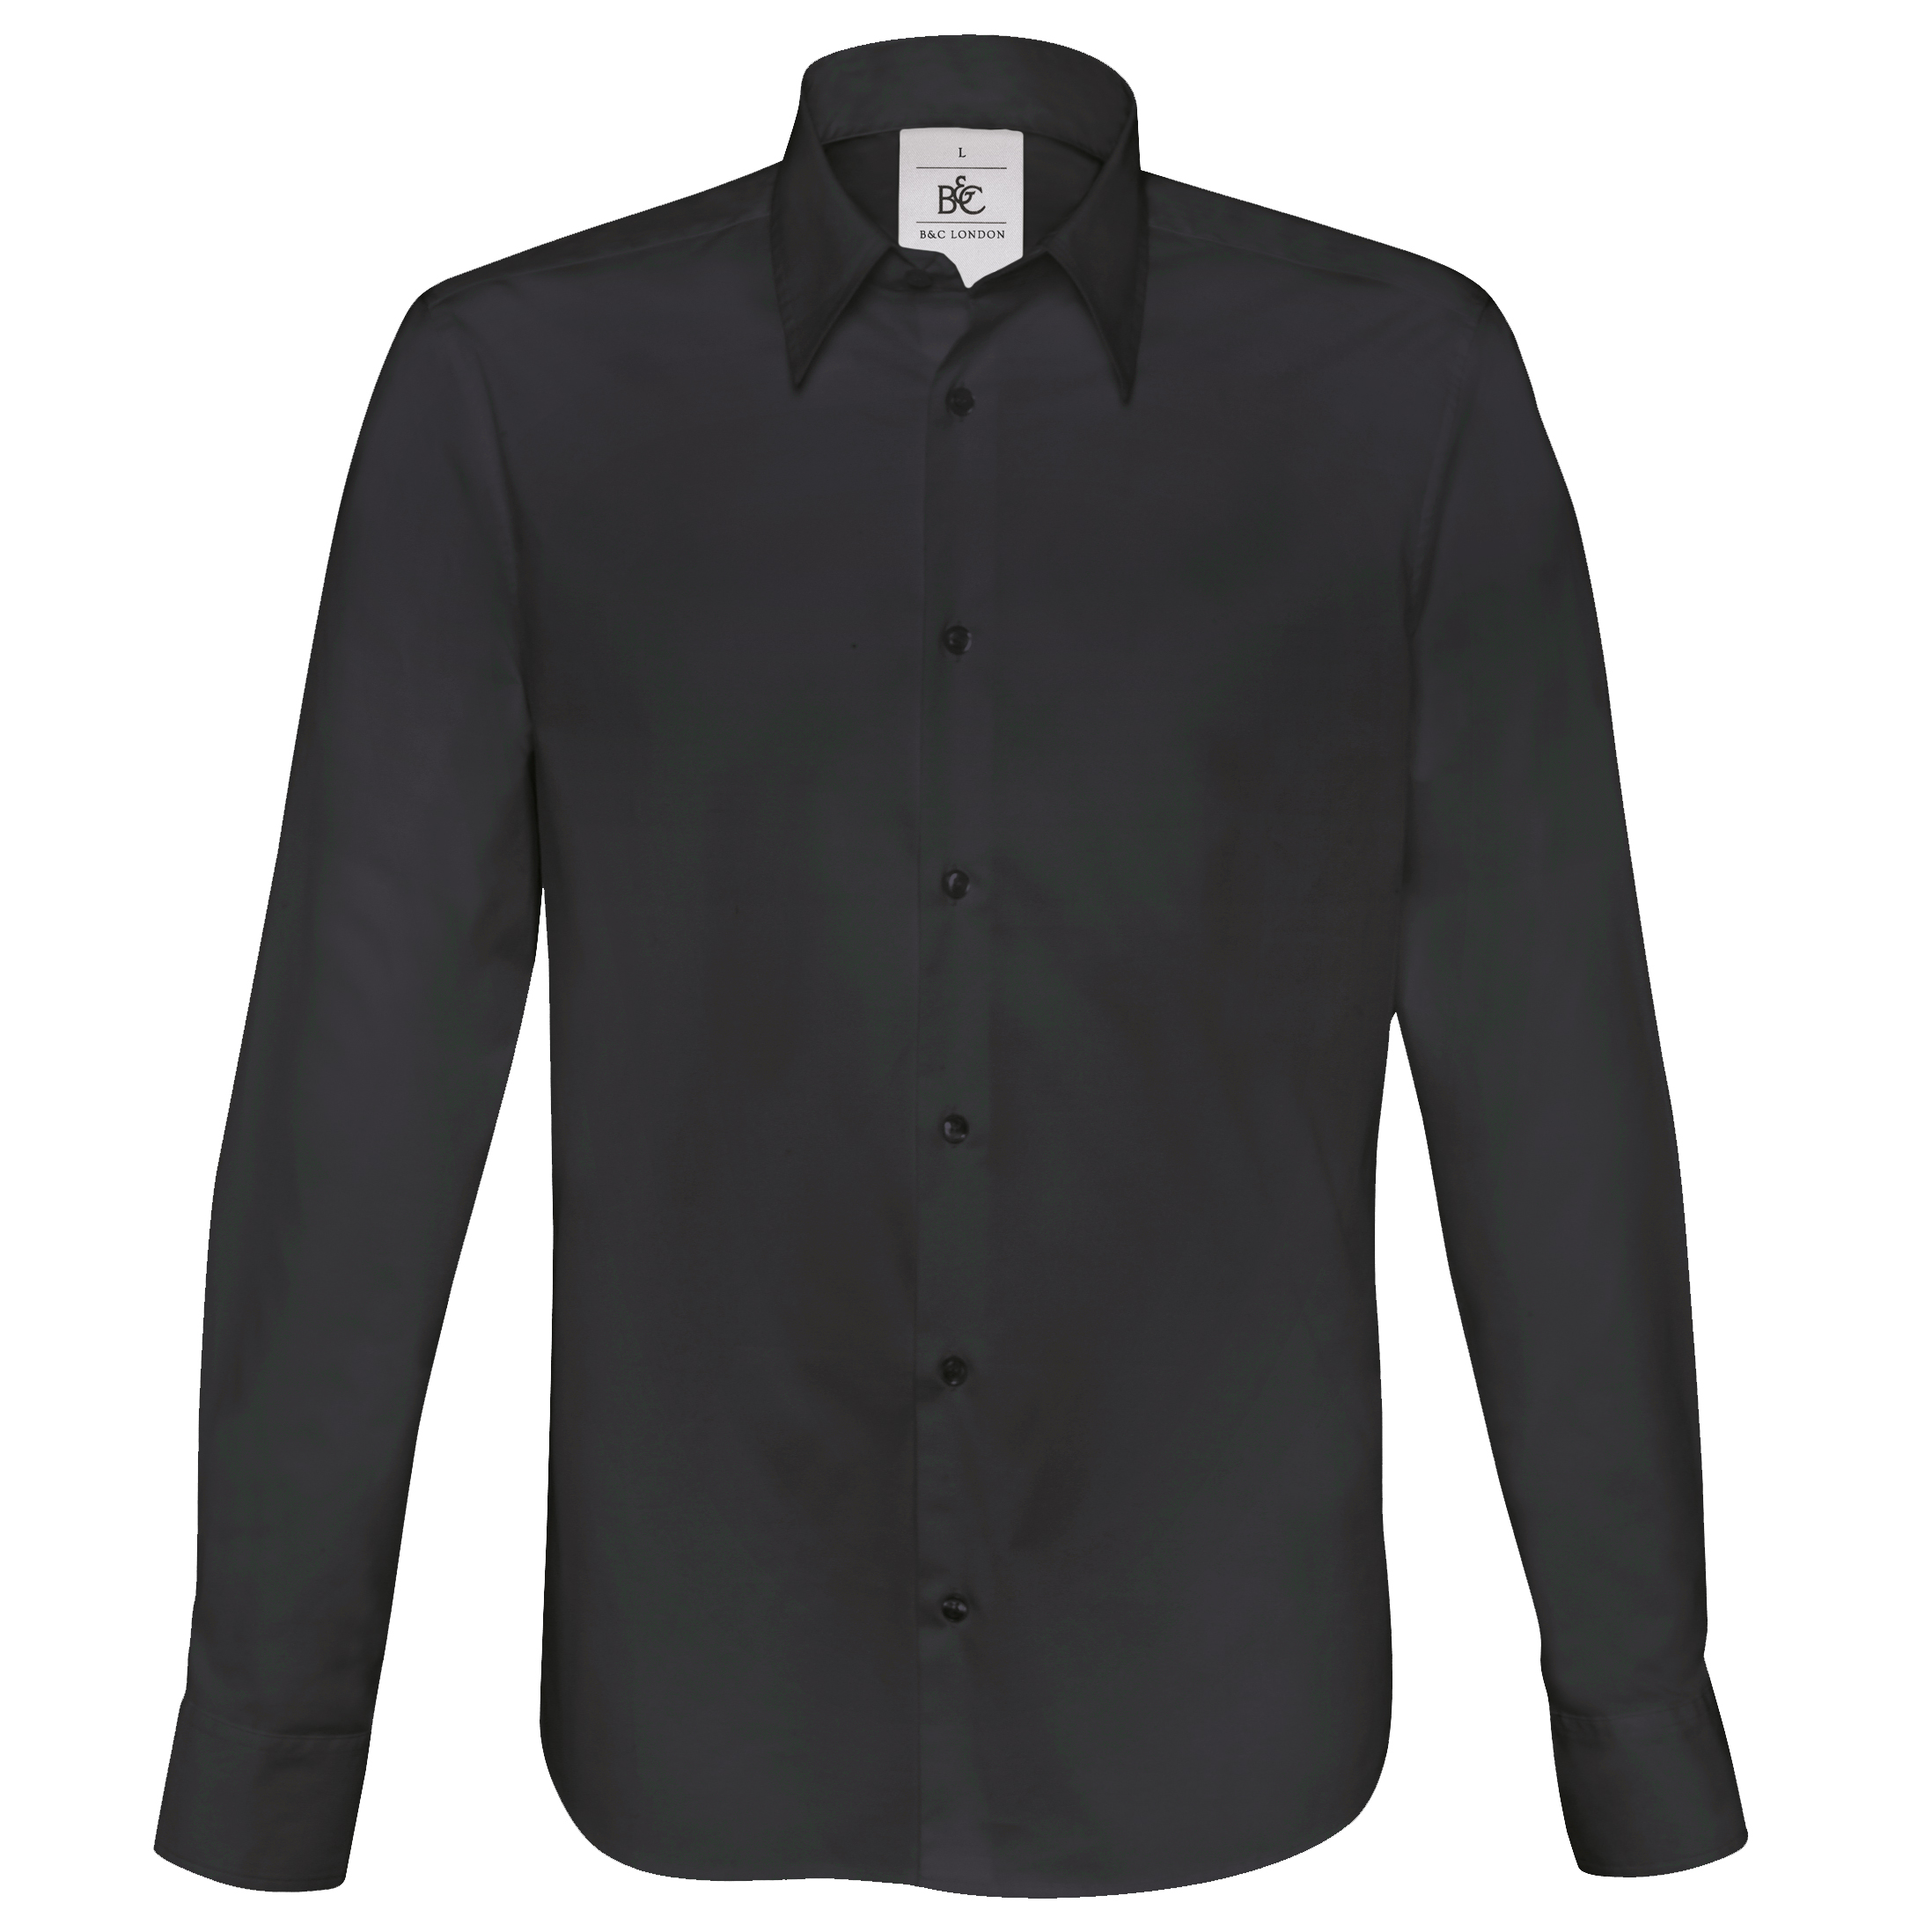 B&C Mens London Long Sleeve Poplin Shirt (S) (Black)